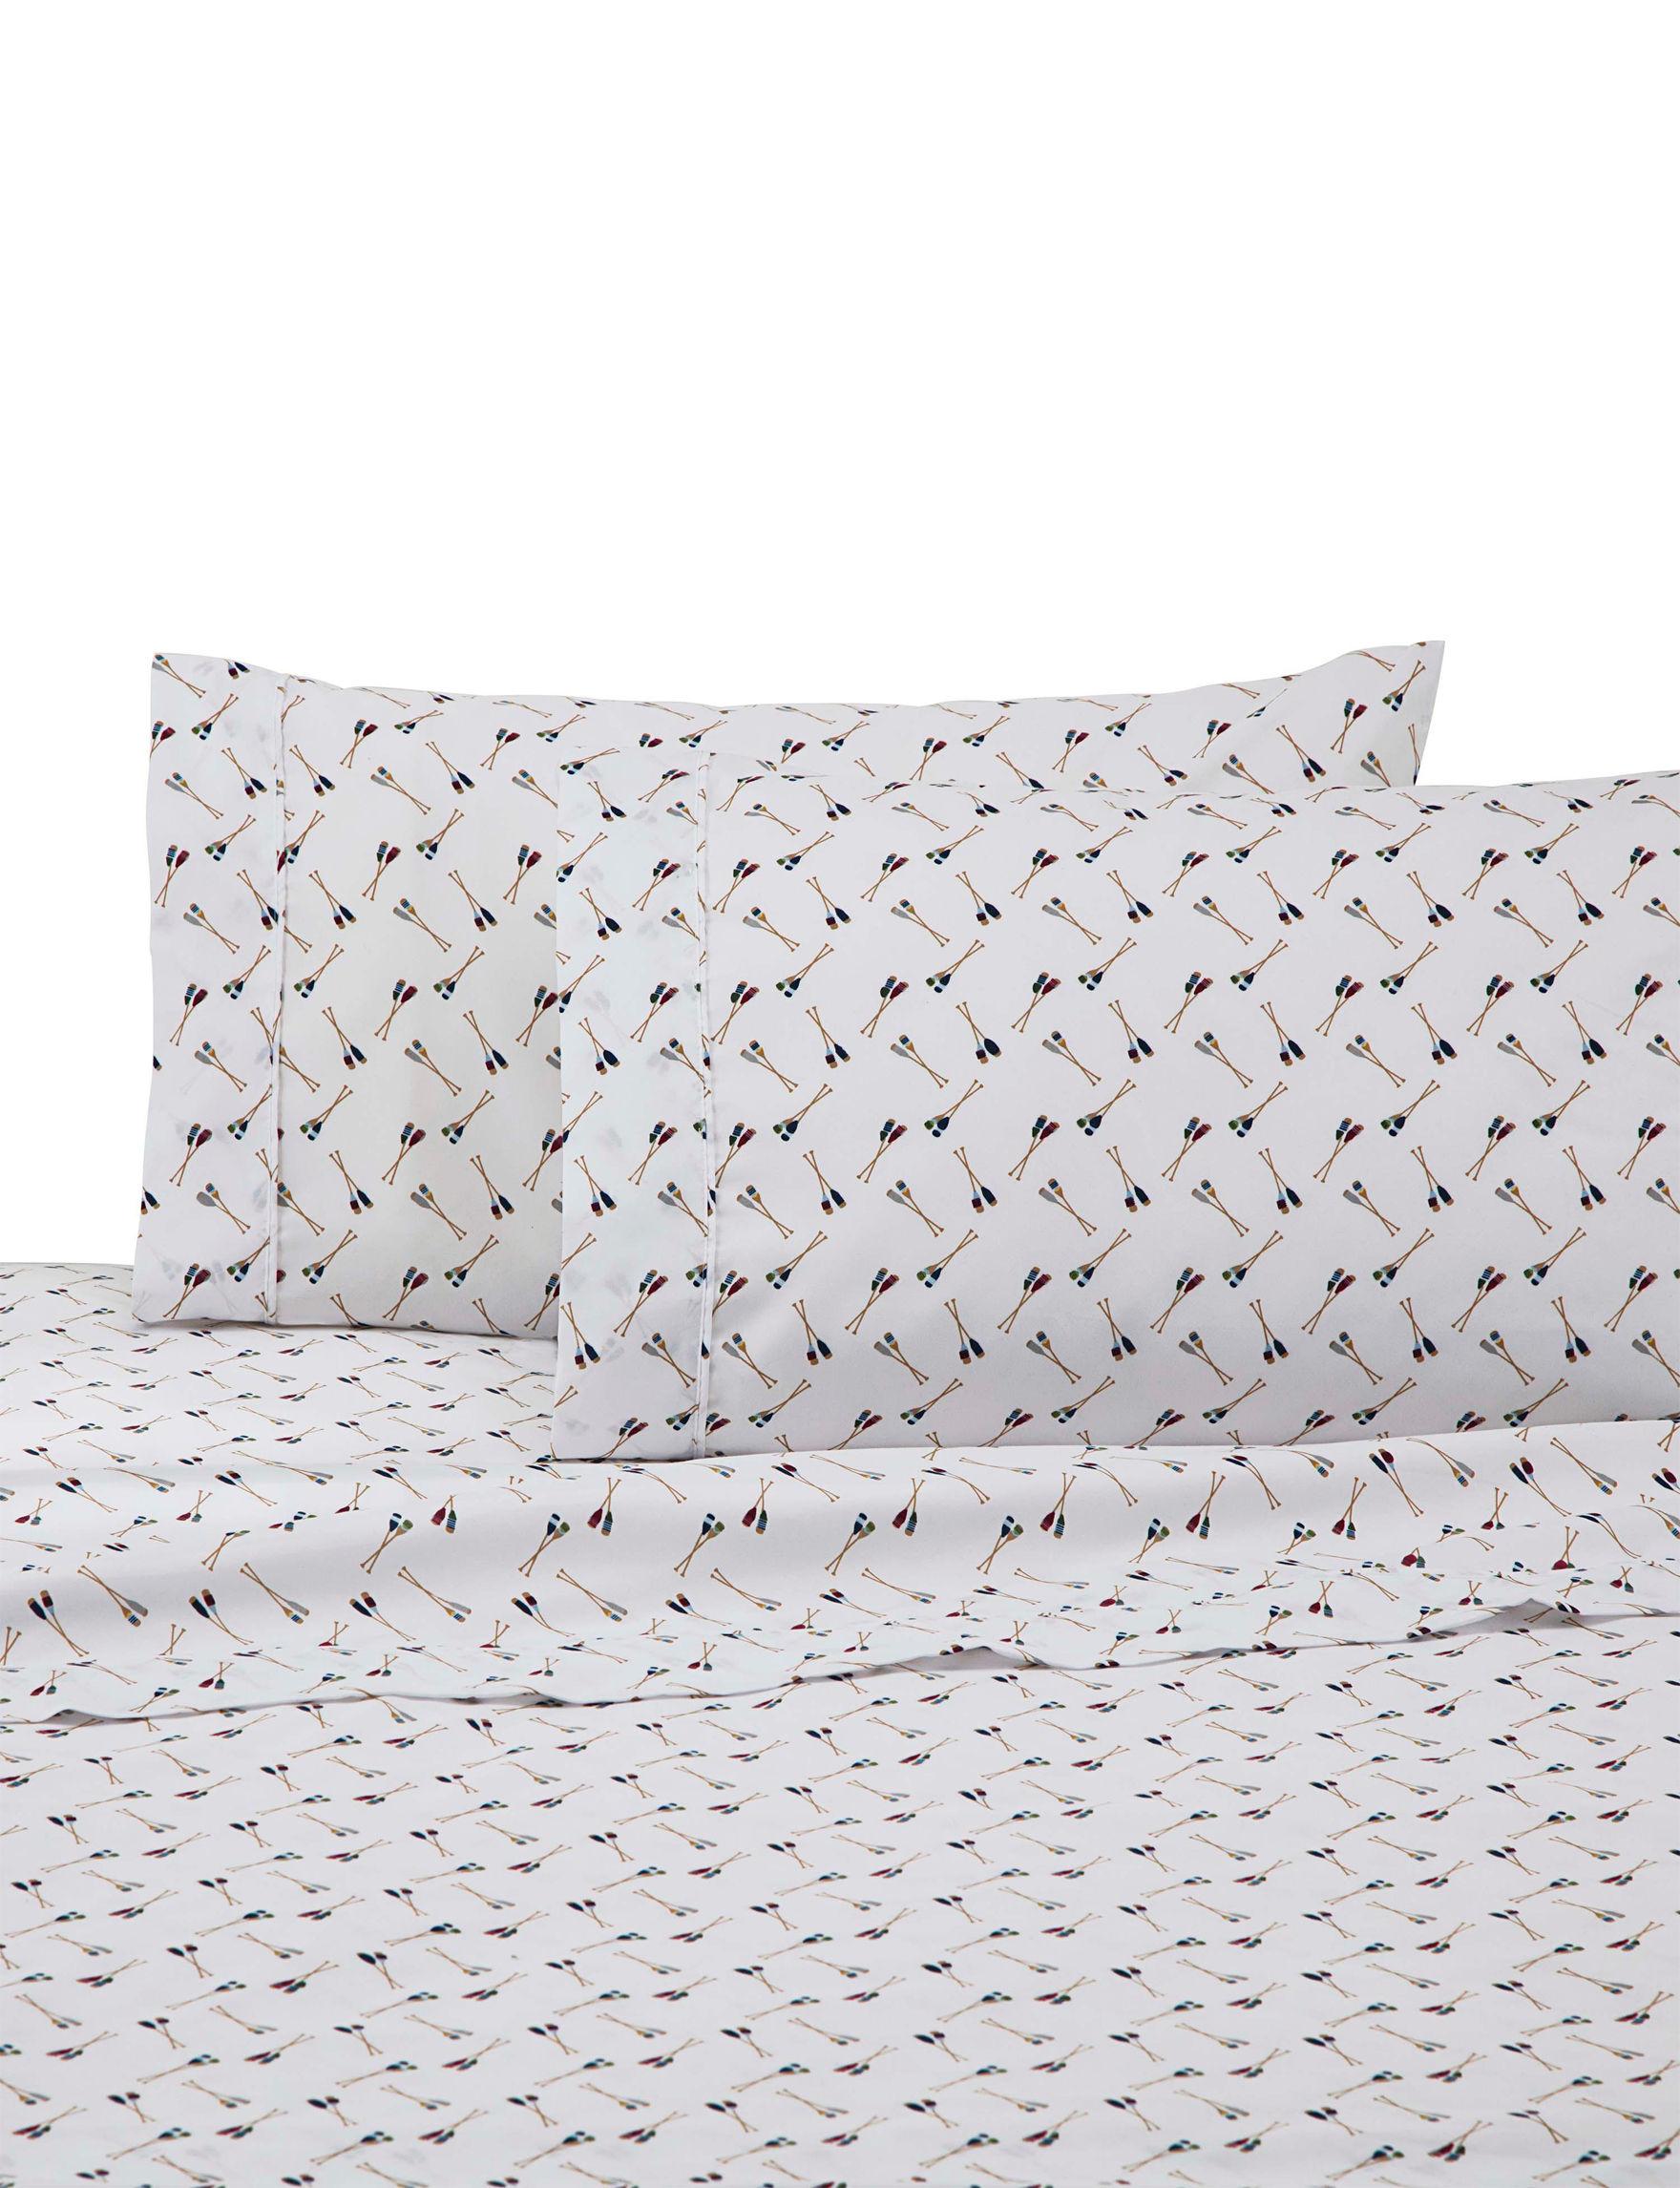 Izod White Multi Sheets & Pillowcases